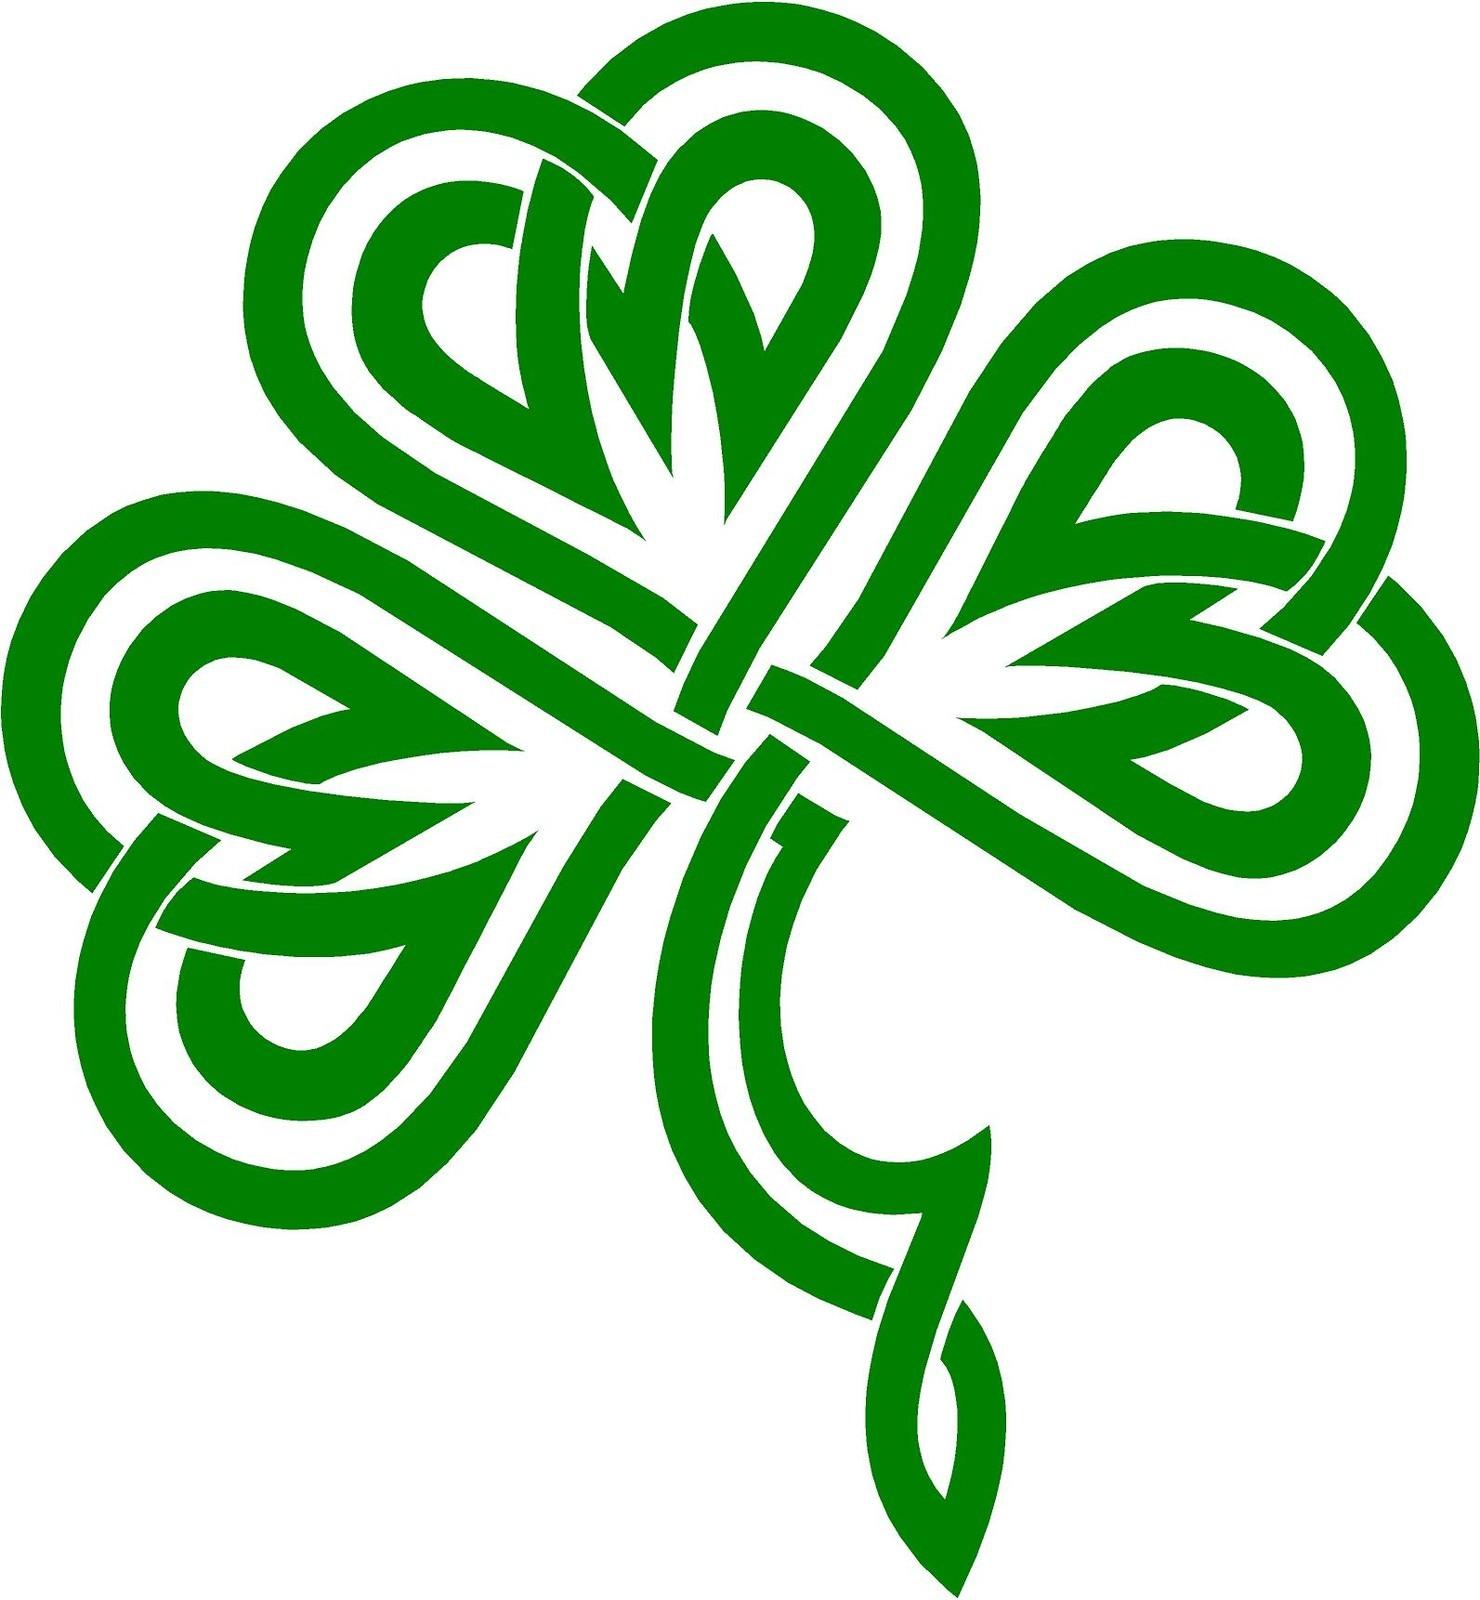 Celtic Clip Art - clipartall .